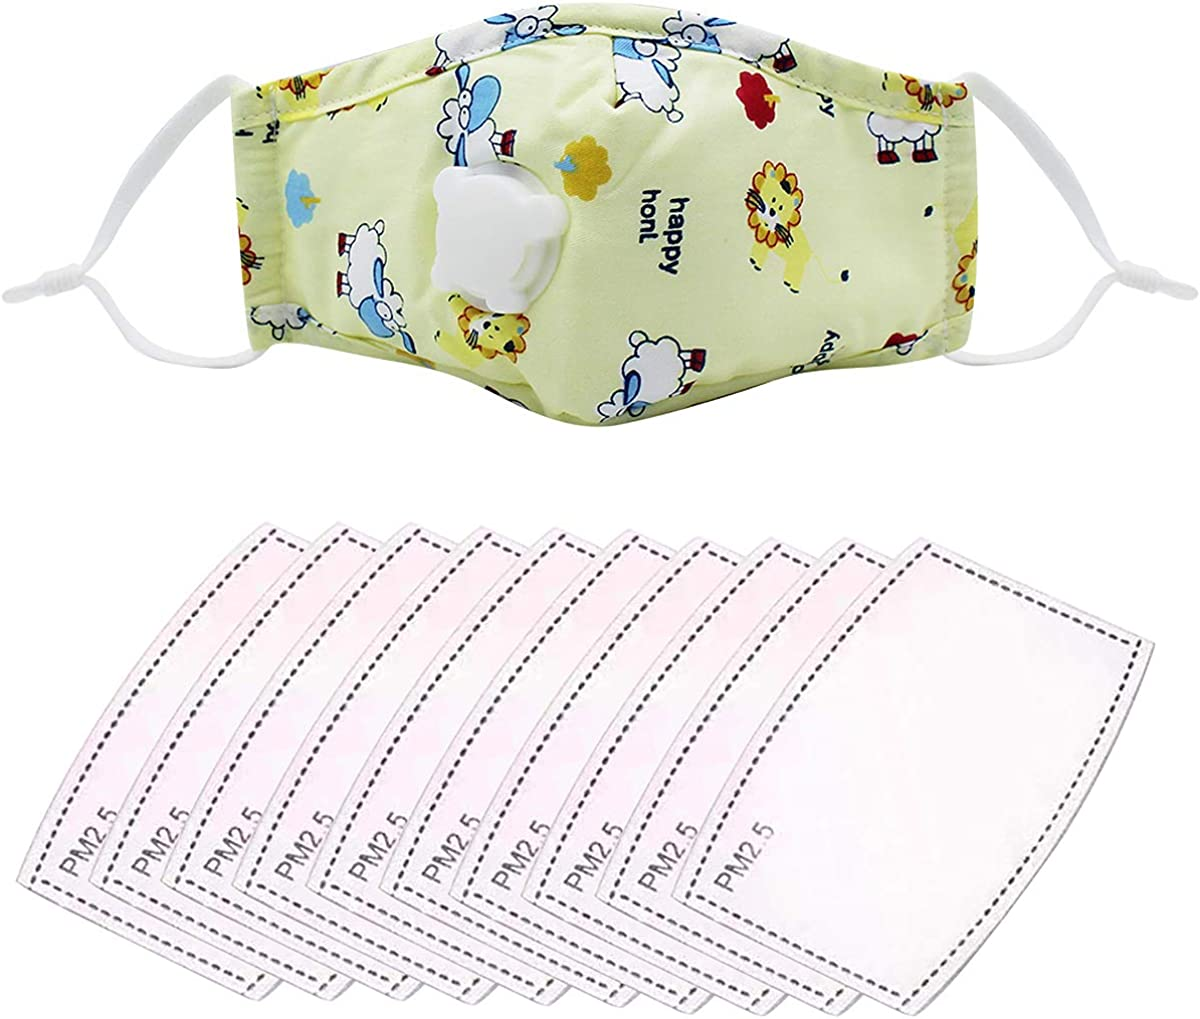 Eilova Orityle 1 Yellow Cotton Mouth Cover Reusable Cute Cartoon Print & 10 PCS Pads for Unisex